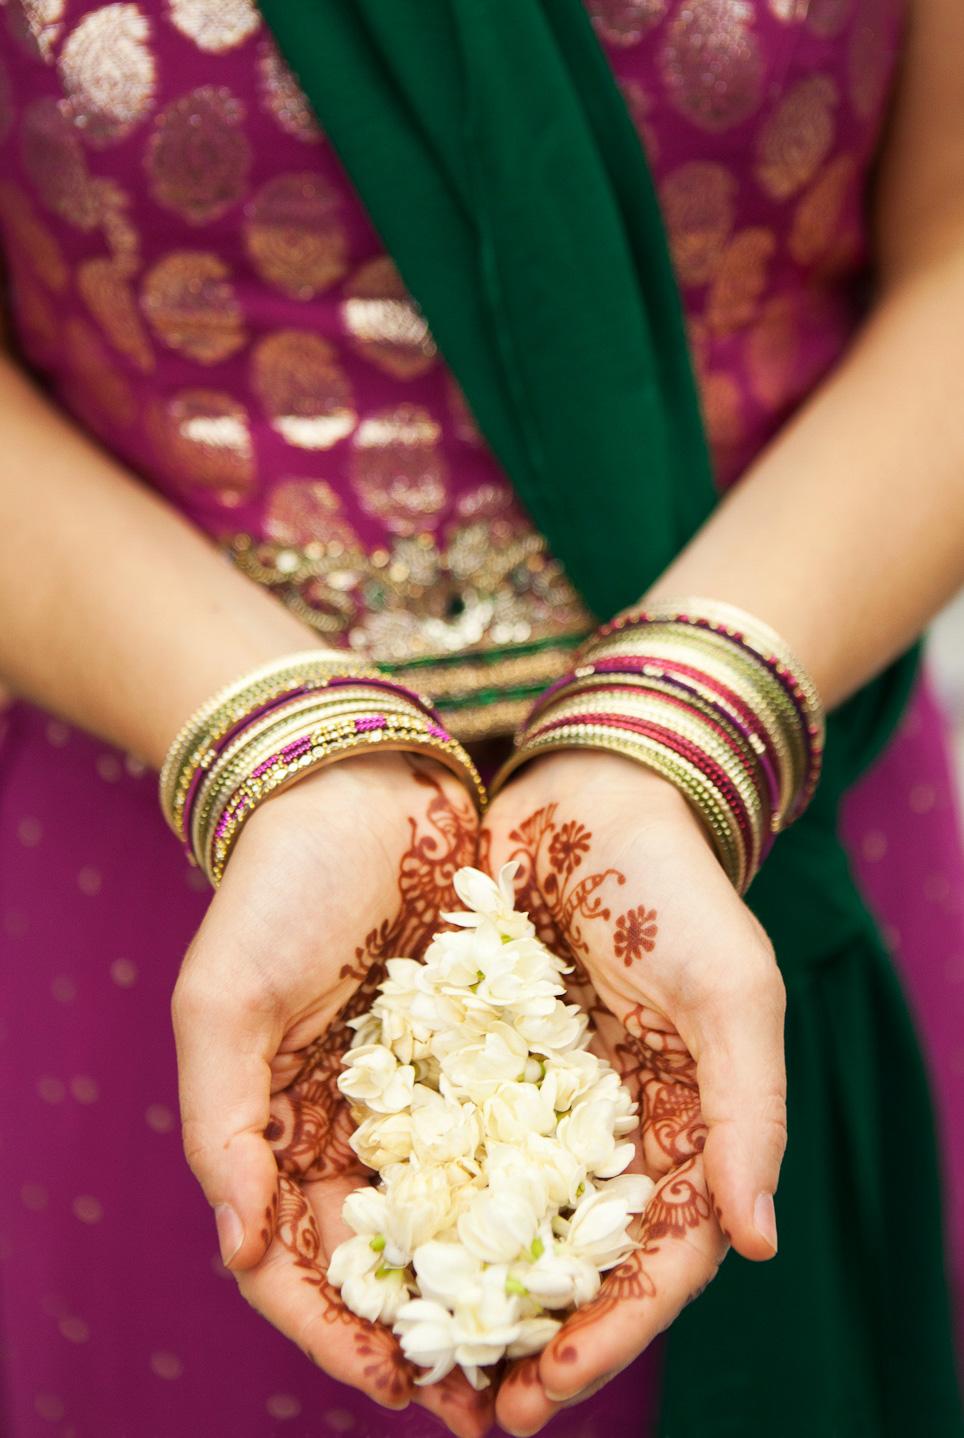 birch-bespoke-events-and-weddings-7.jpg